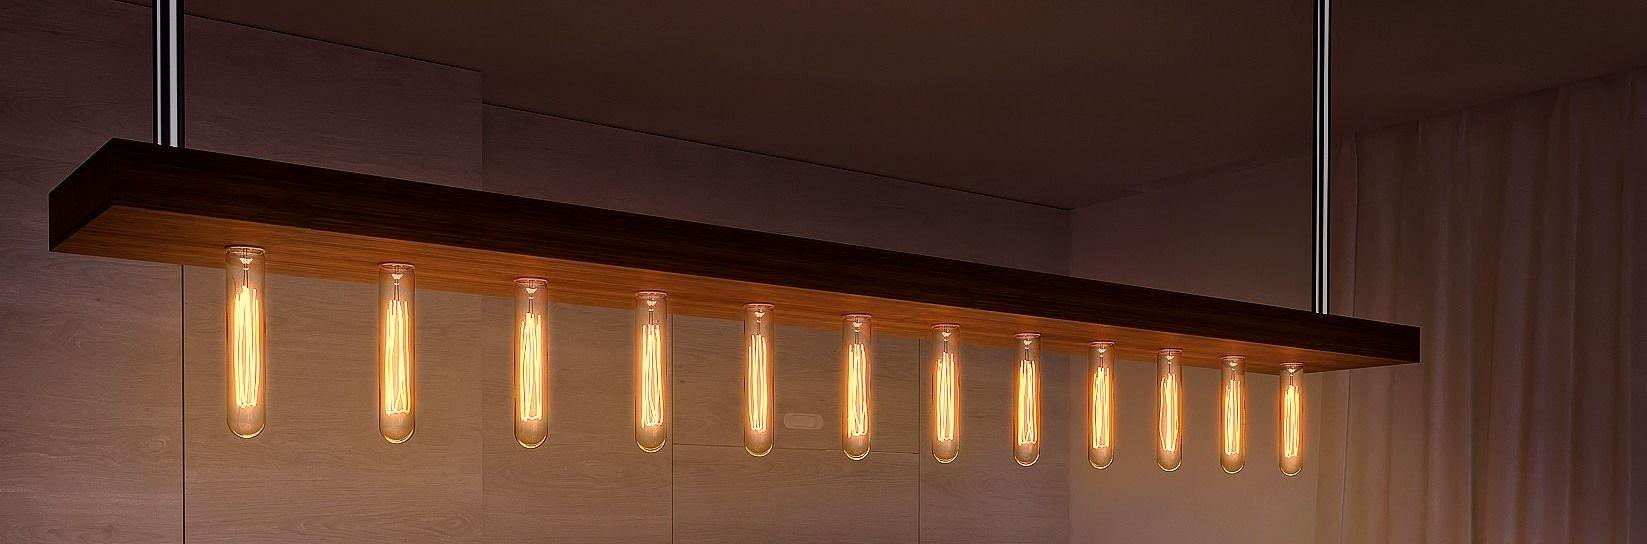 luminaire-Bocani_bambou-cognac_inox_ampoule-retro_SLIDER2.jpg (1647×544)